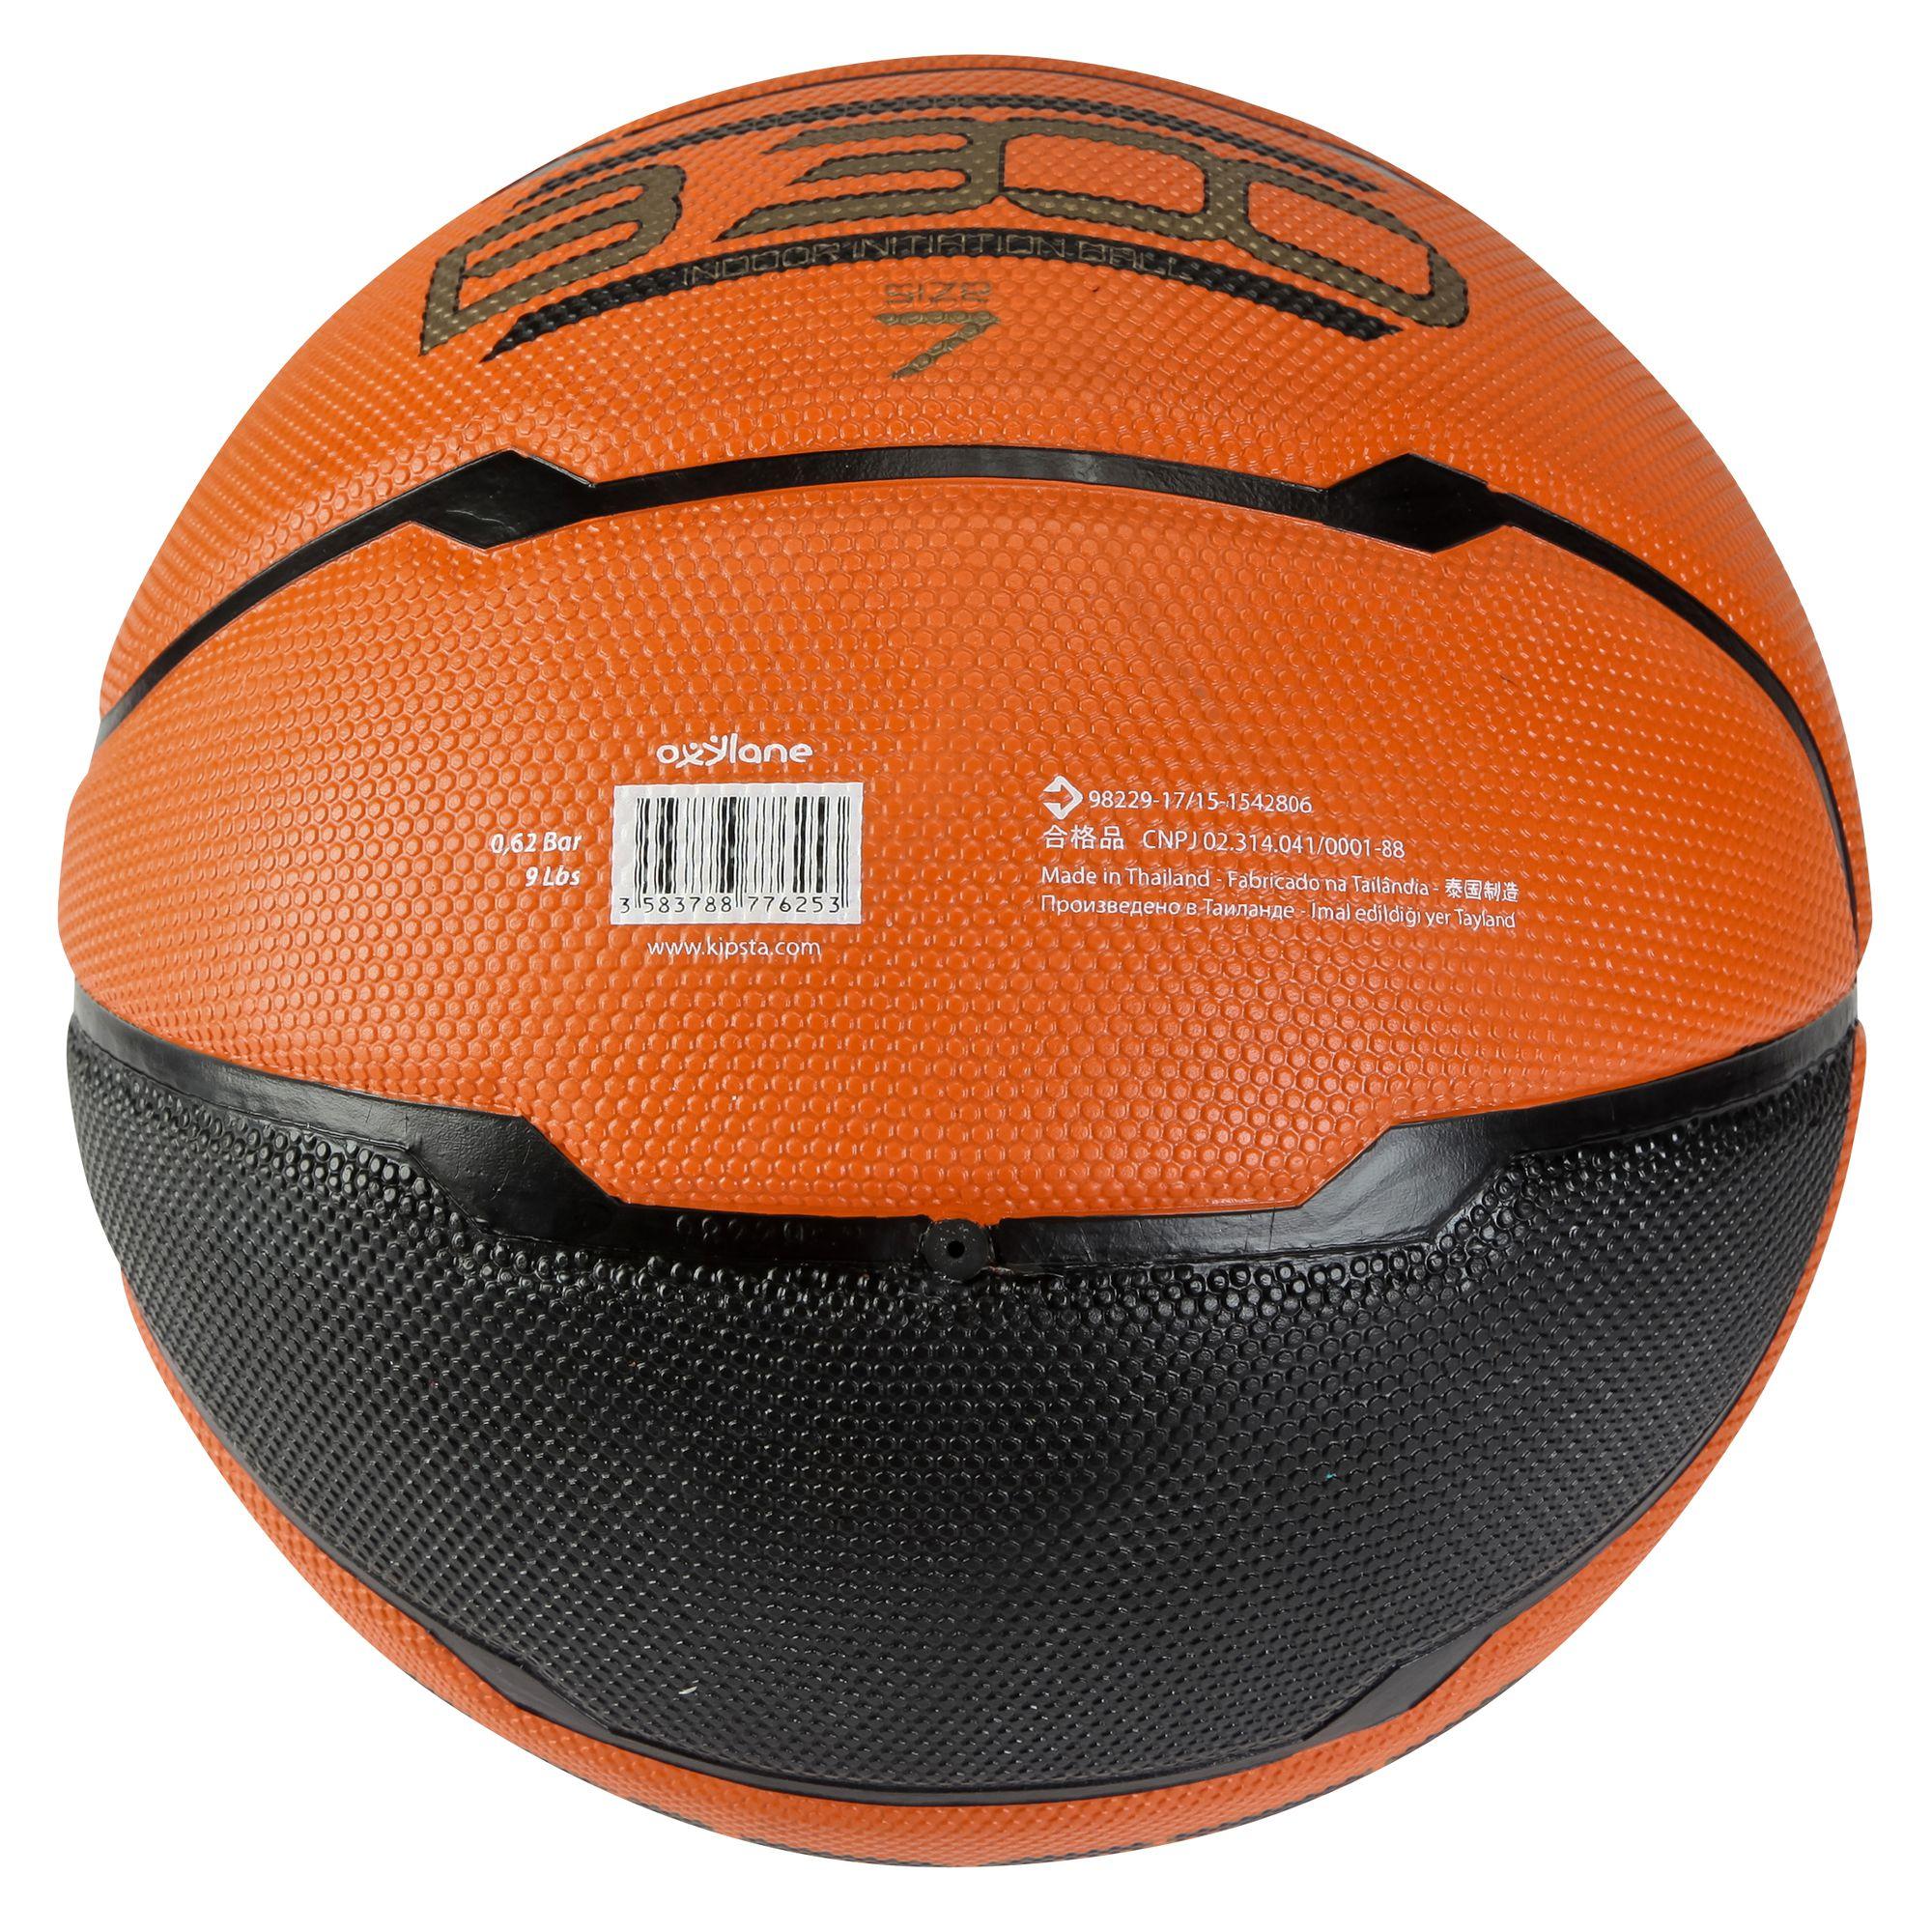 Ballon basket ball b300 taille 7 entrainement clubs collectivit s decathlon pro - Ballon basket decathlon ...